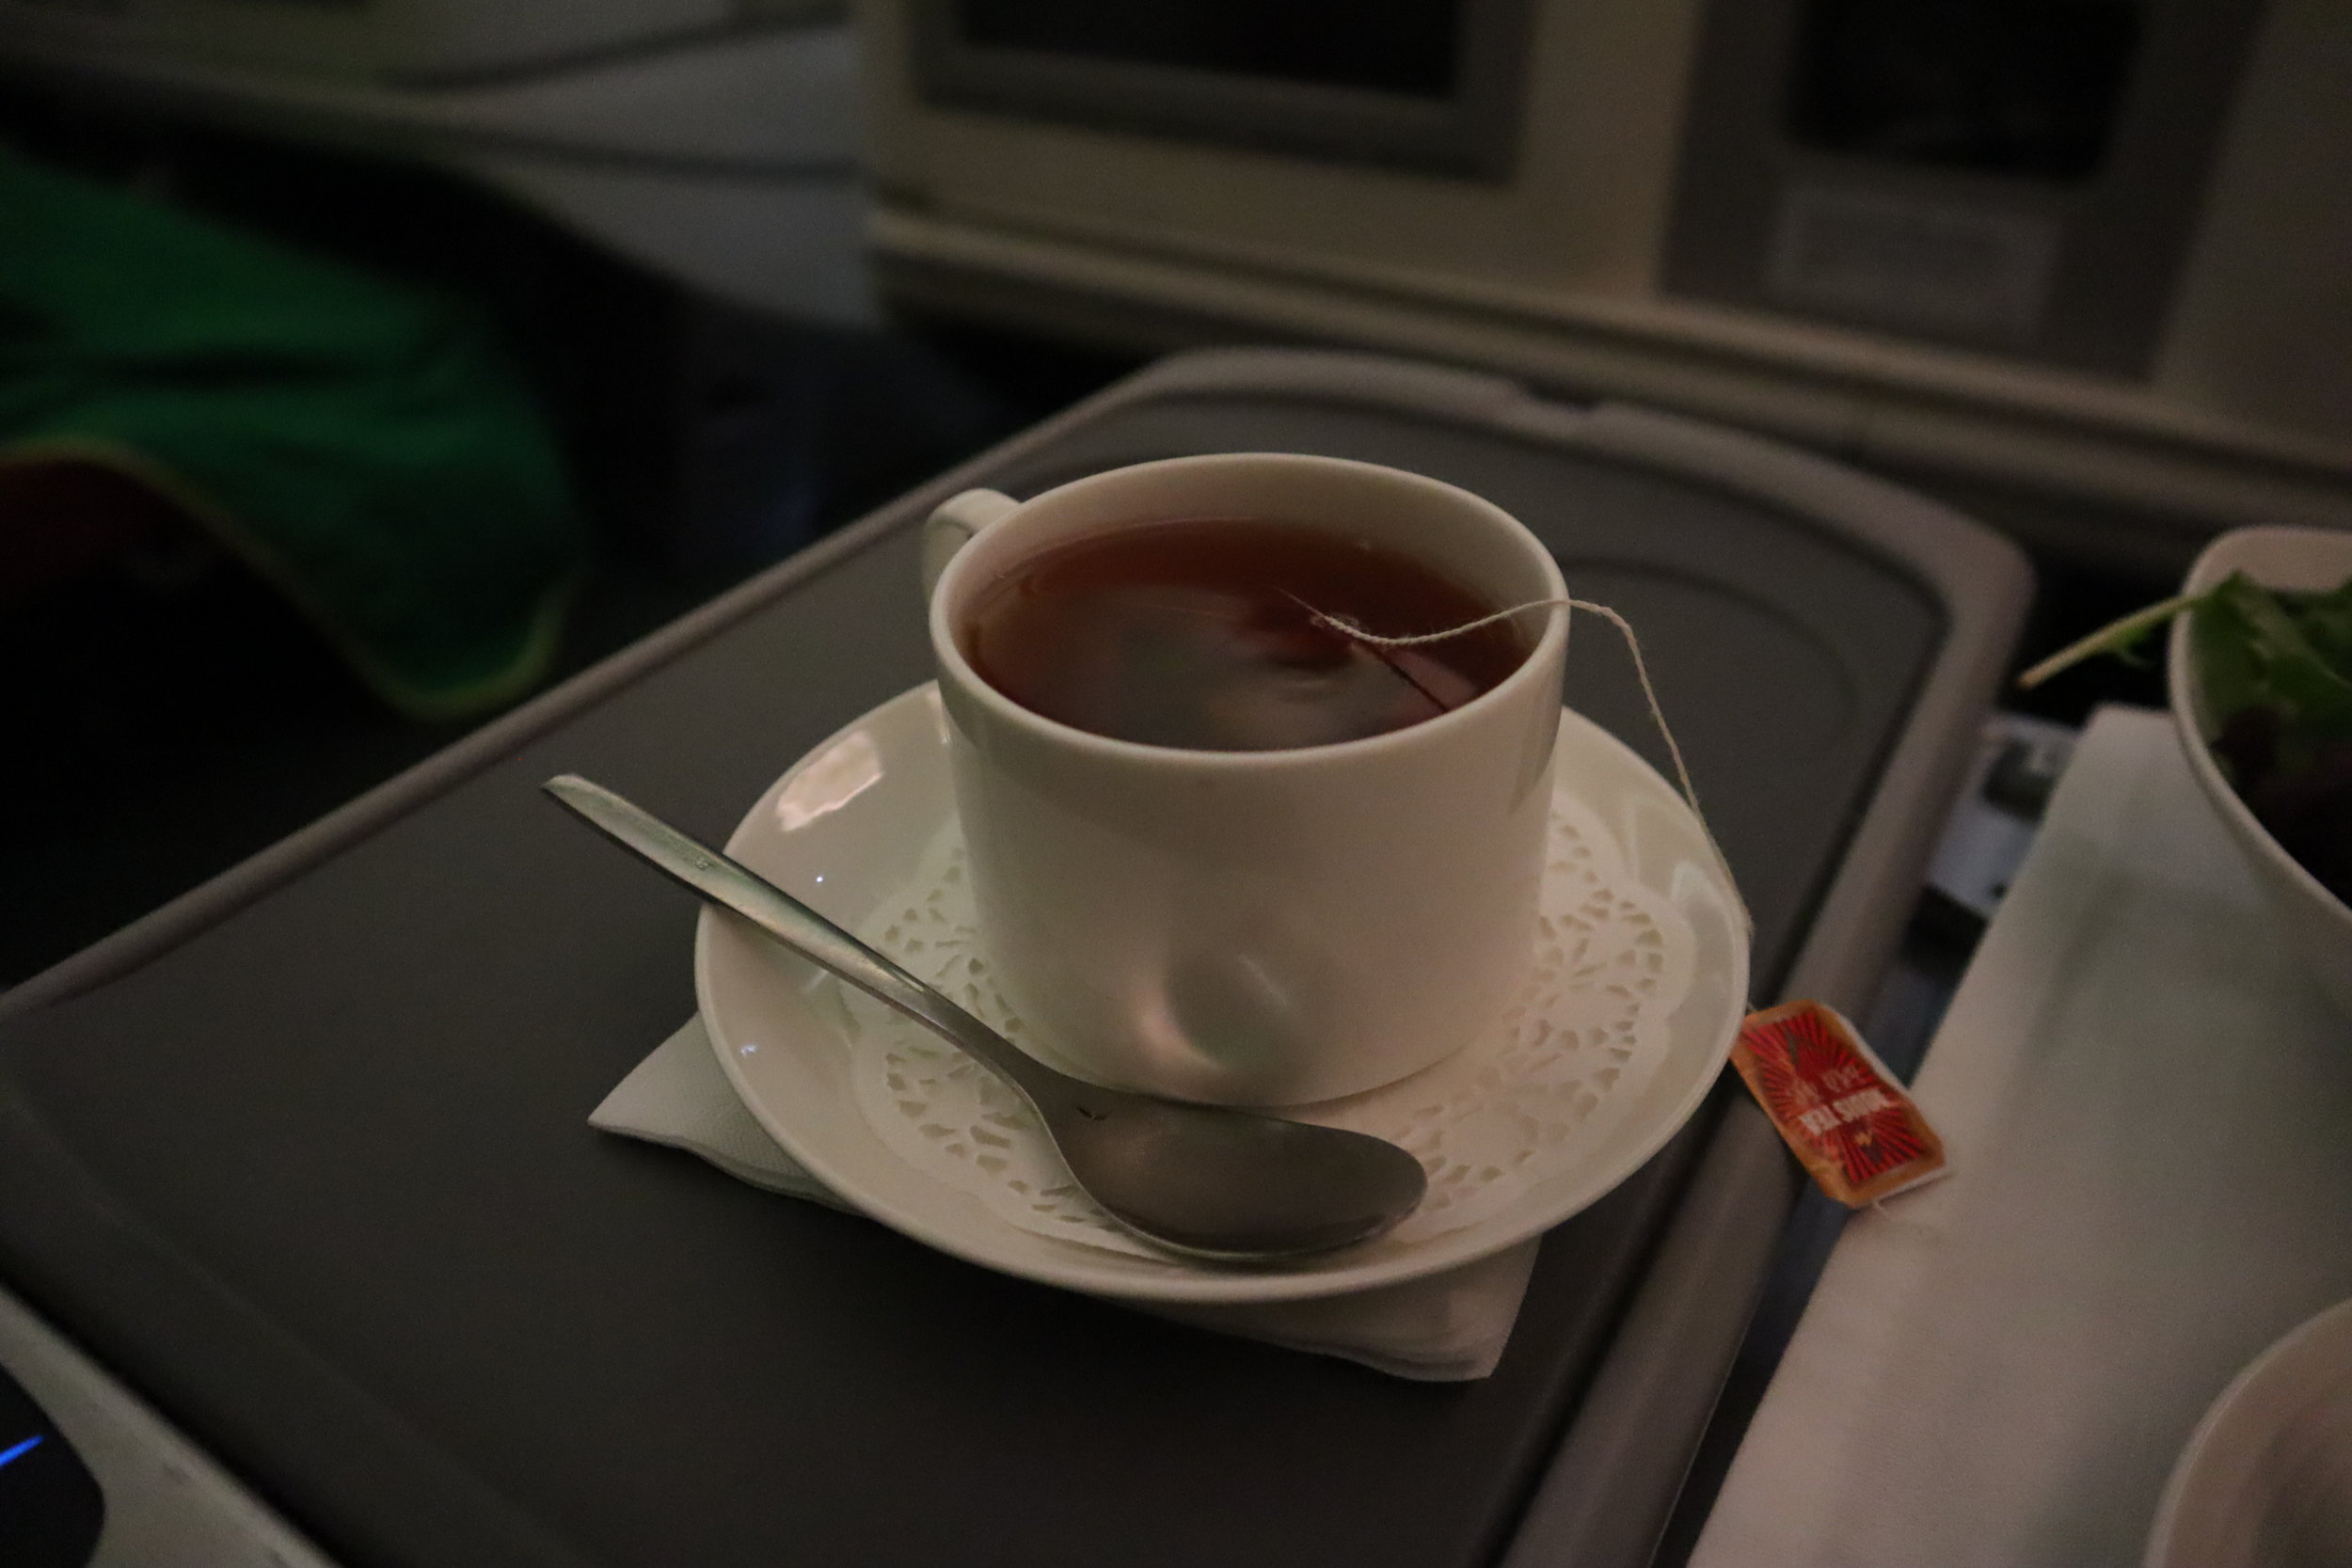 Ethiopian Airlines business class – Black tea